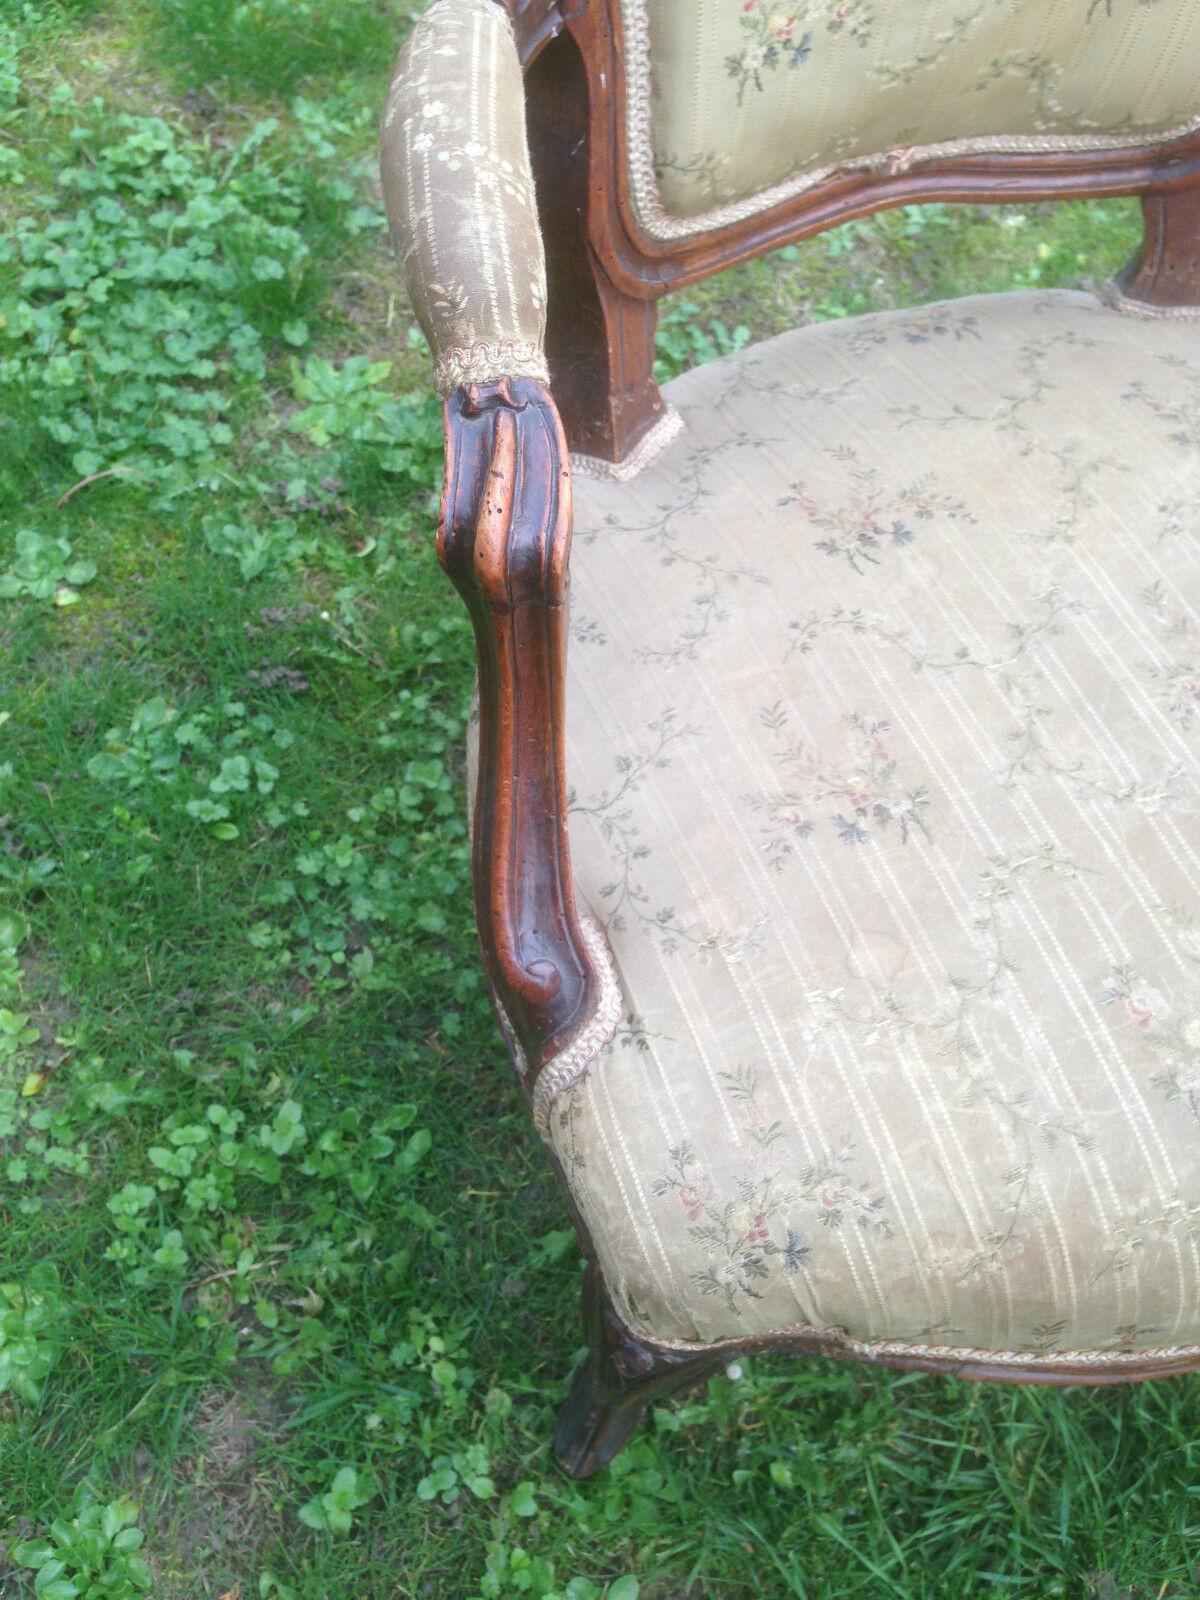 fauteuil cabriolet ancien 18 me eur 250 00 picclick fr. Black Bedroom Furniture Sets. Home Design Ideas